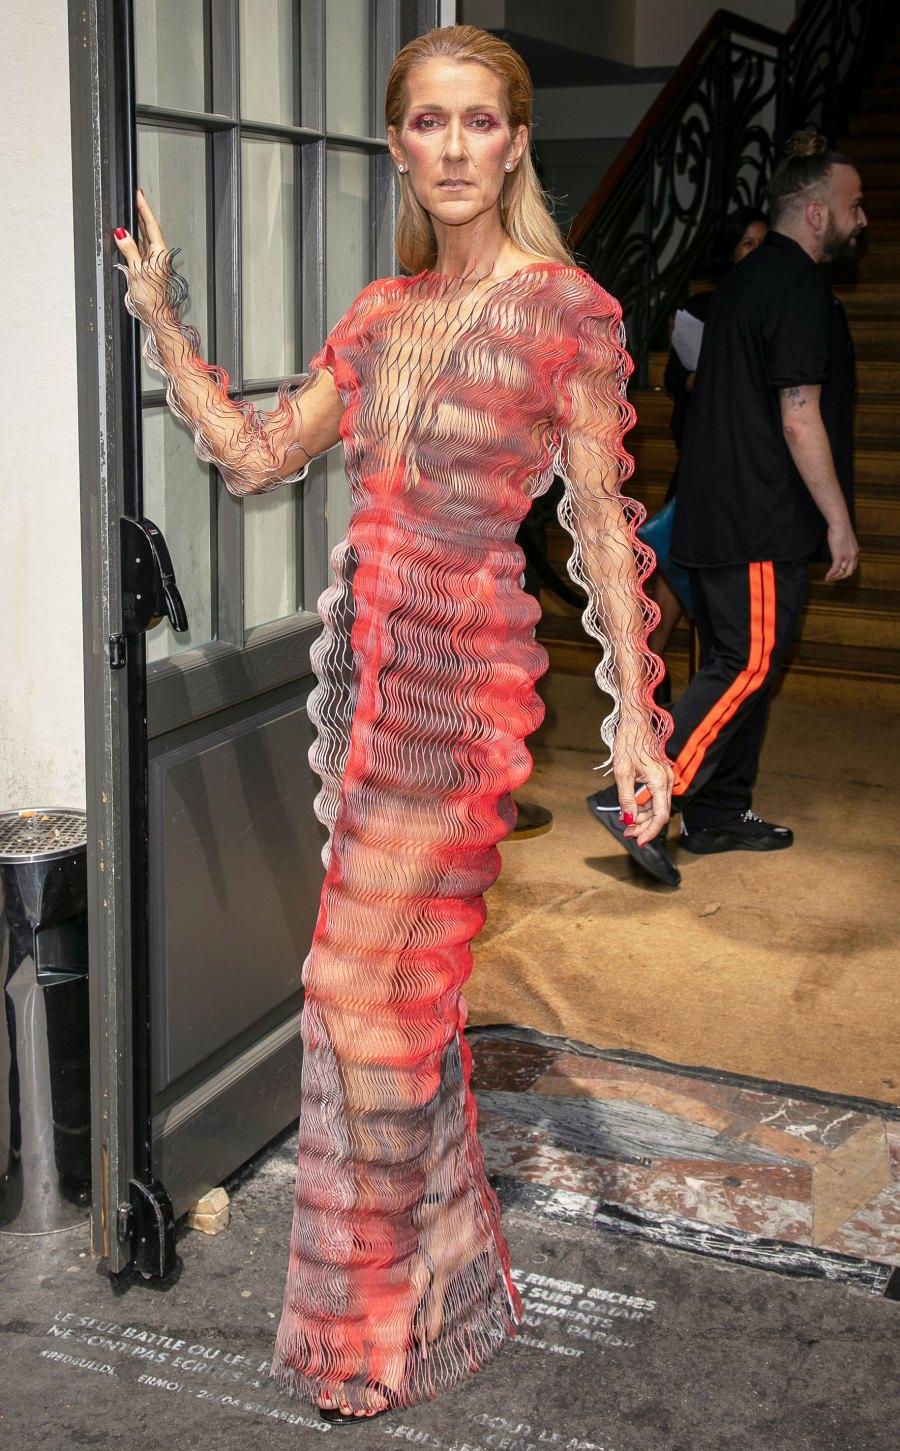 Celine Dion Ombre Dress July 01, 2019